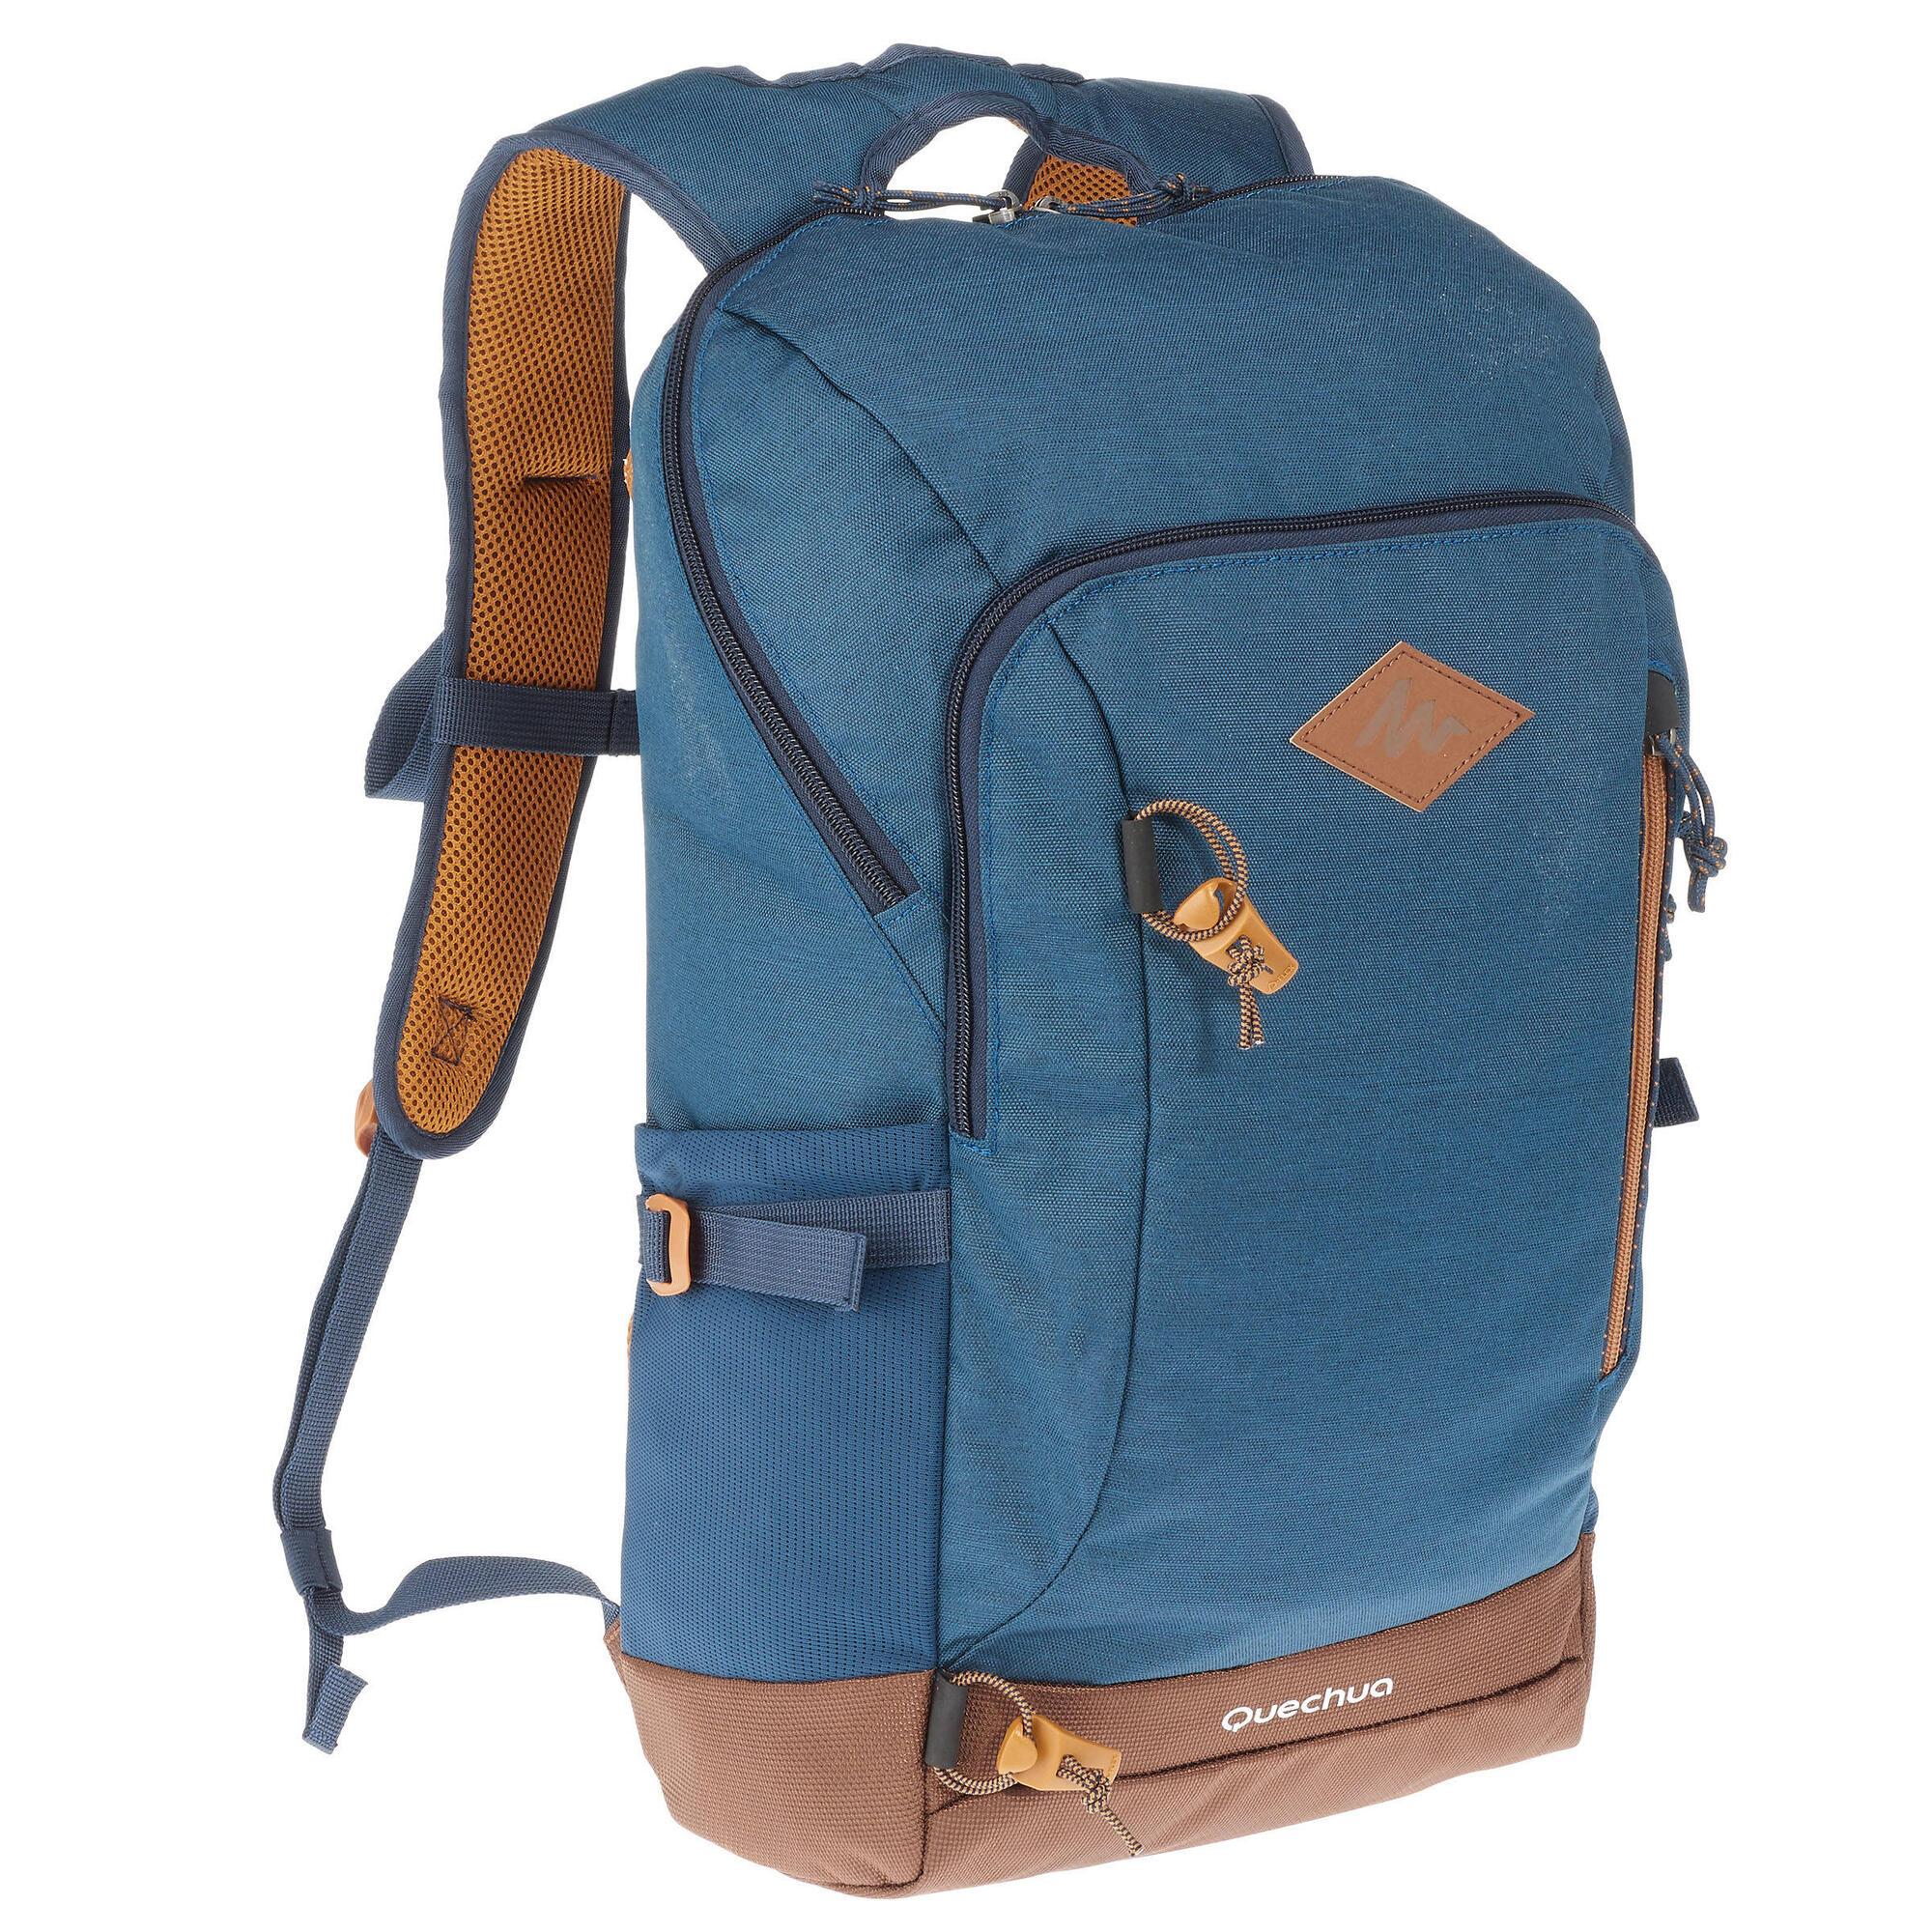 Nh500 20 L Hiking Backpack Blue Quechua